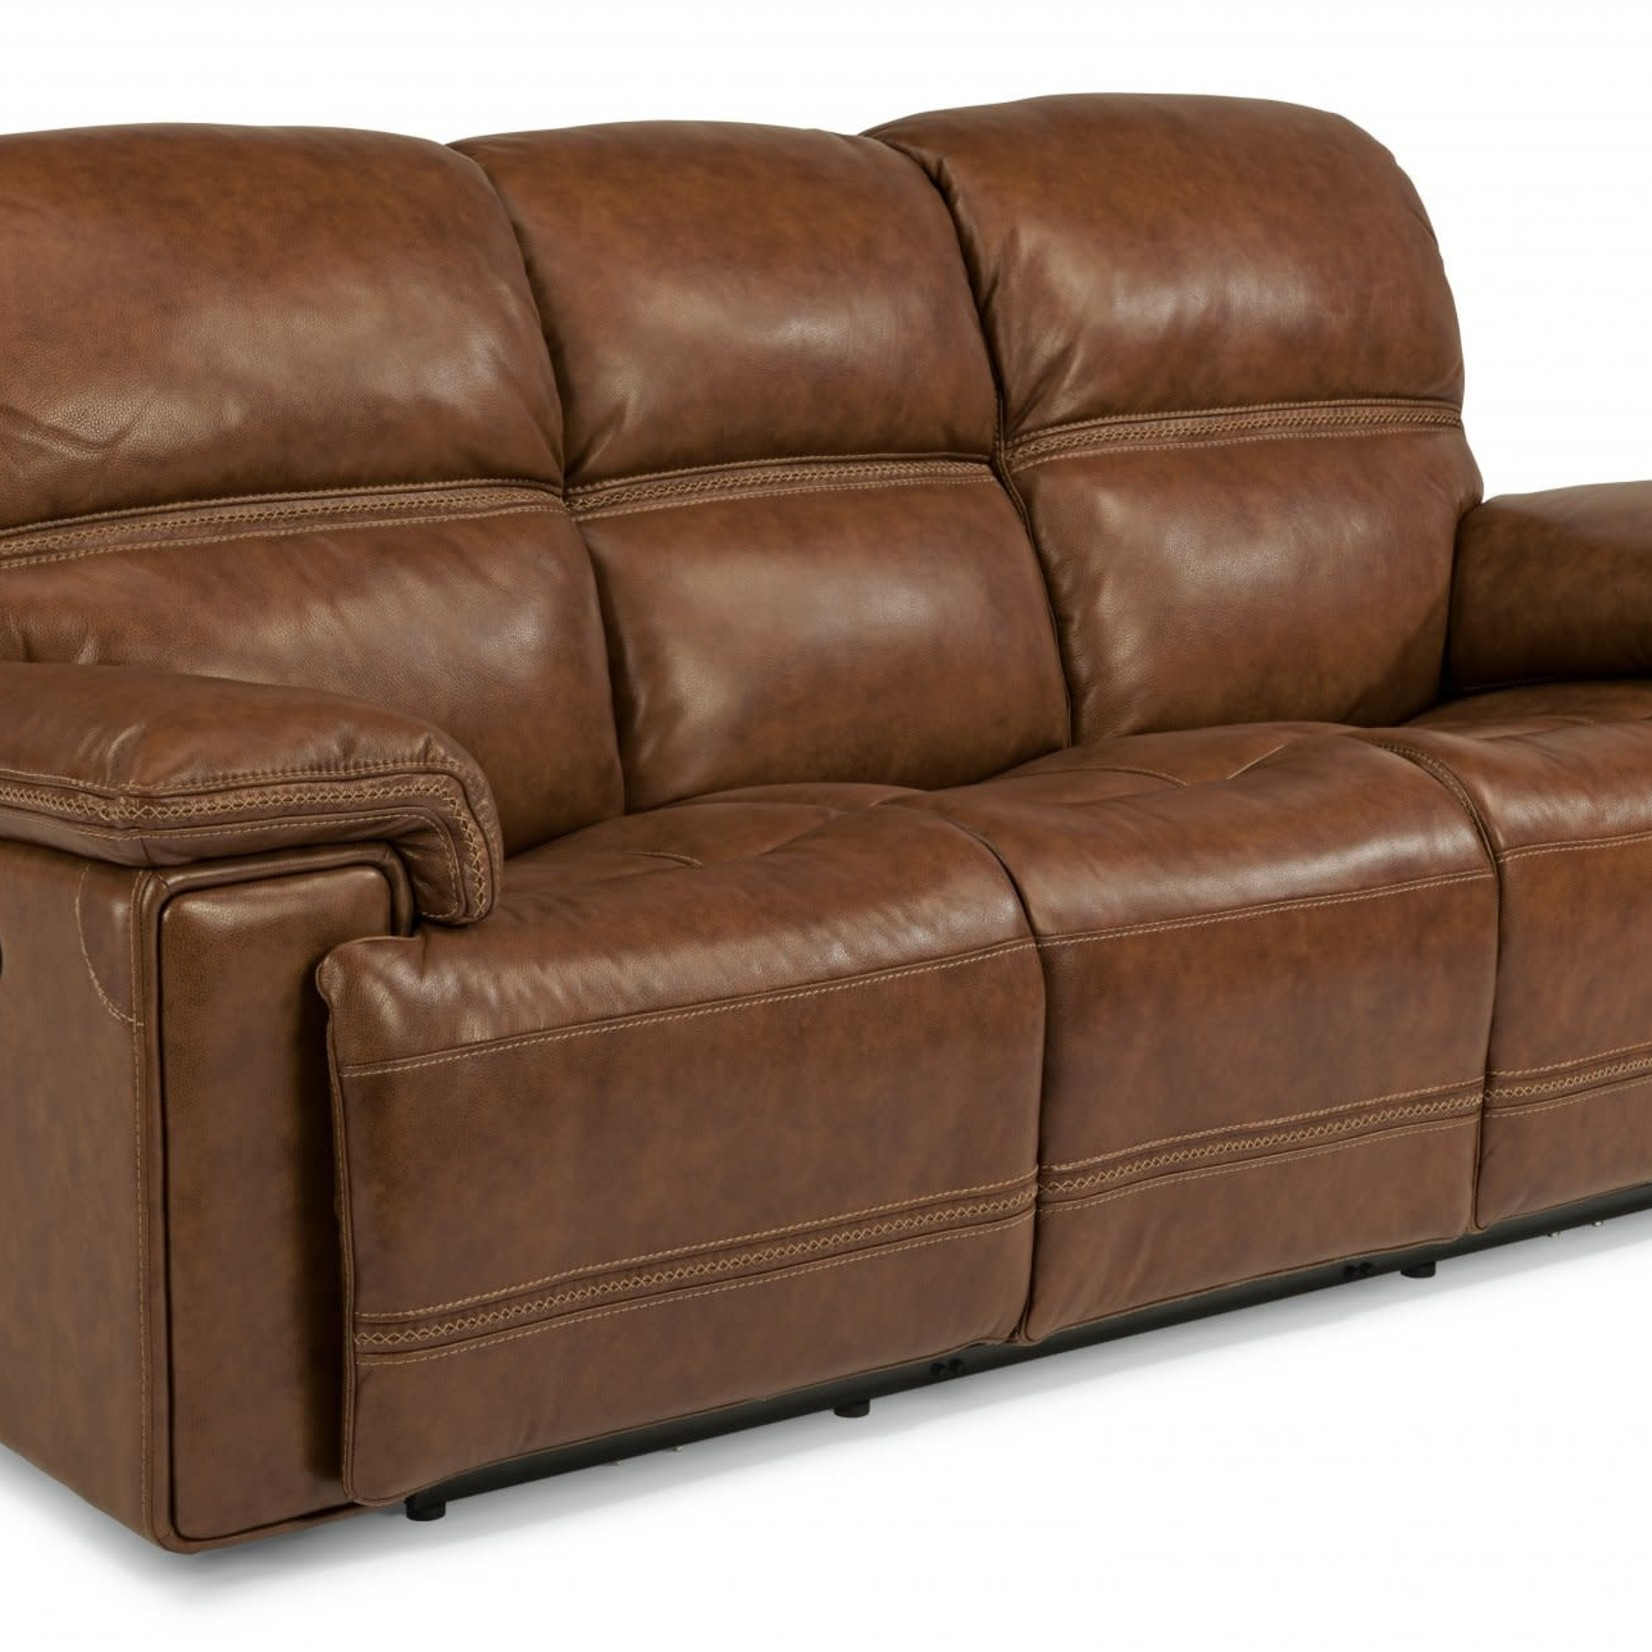 Fenwick Leather Power Reclining Sofa